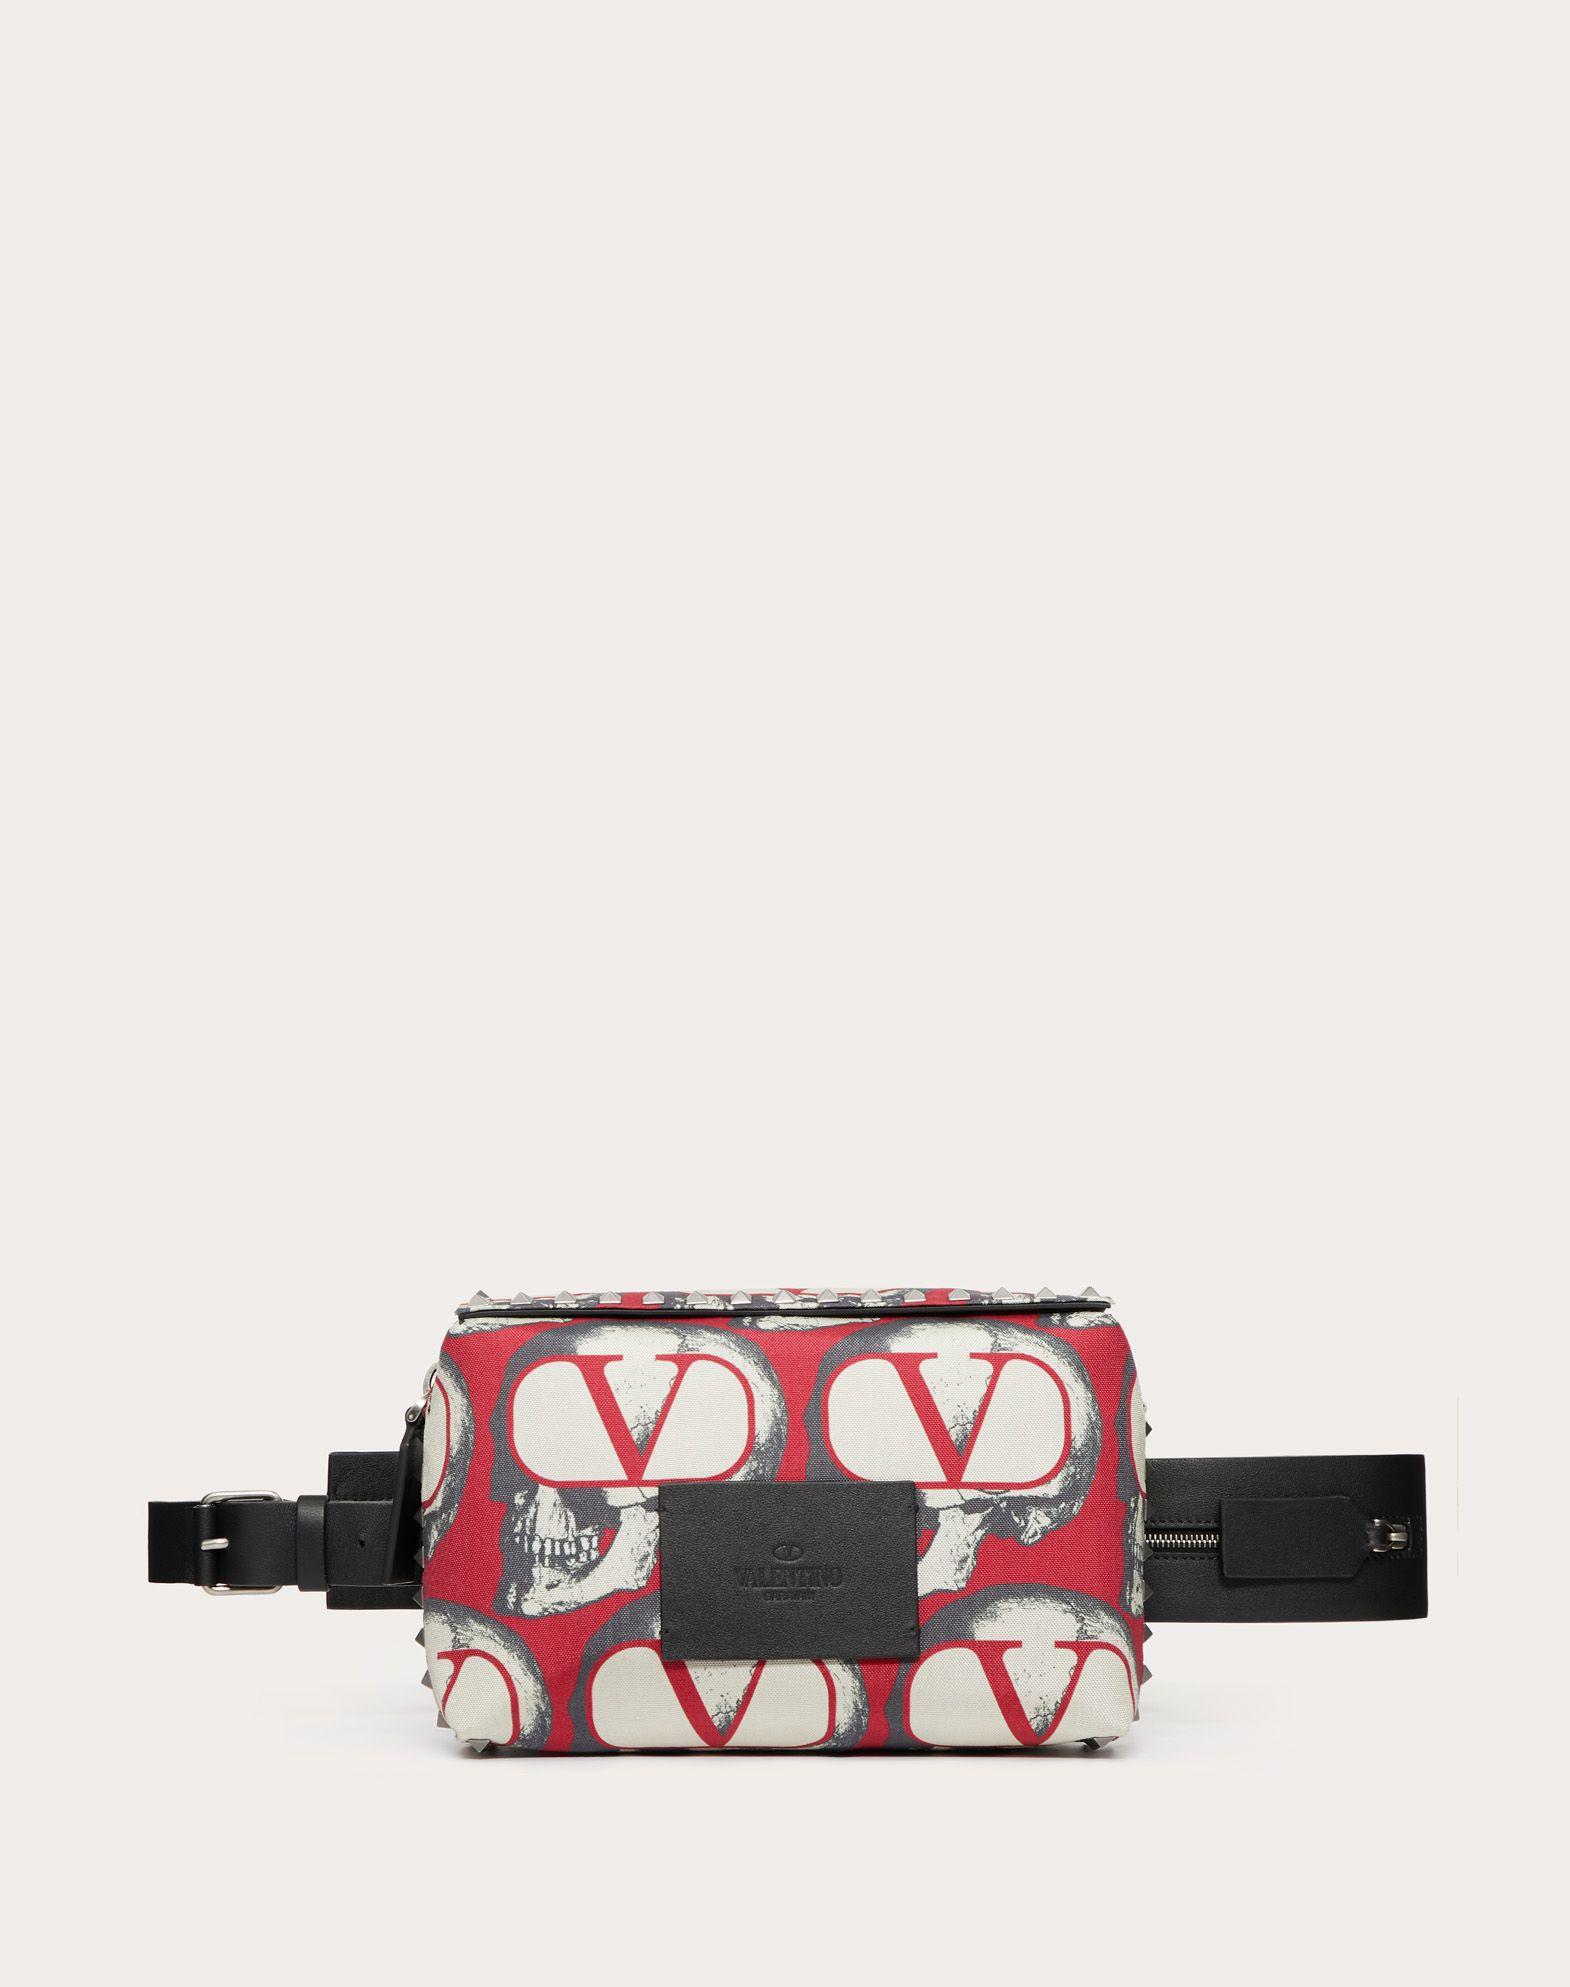 Valentino Garavani Undercover Rockstud belt bag